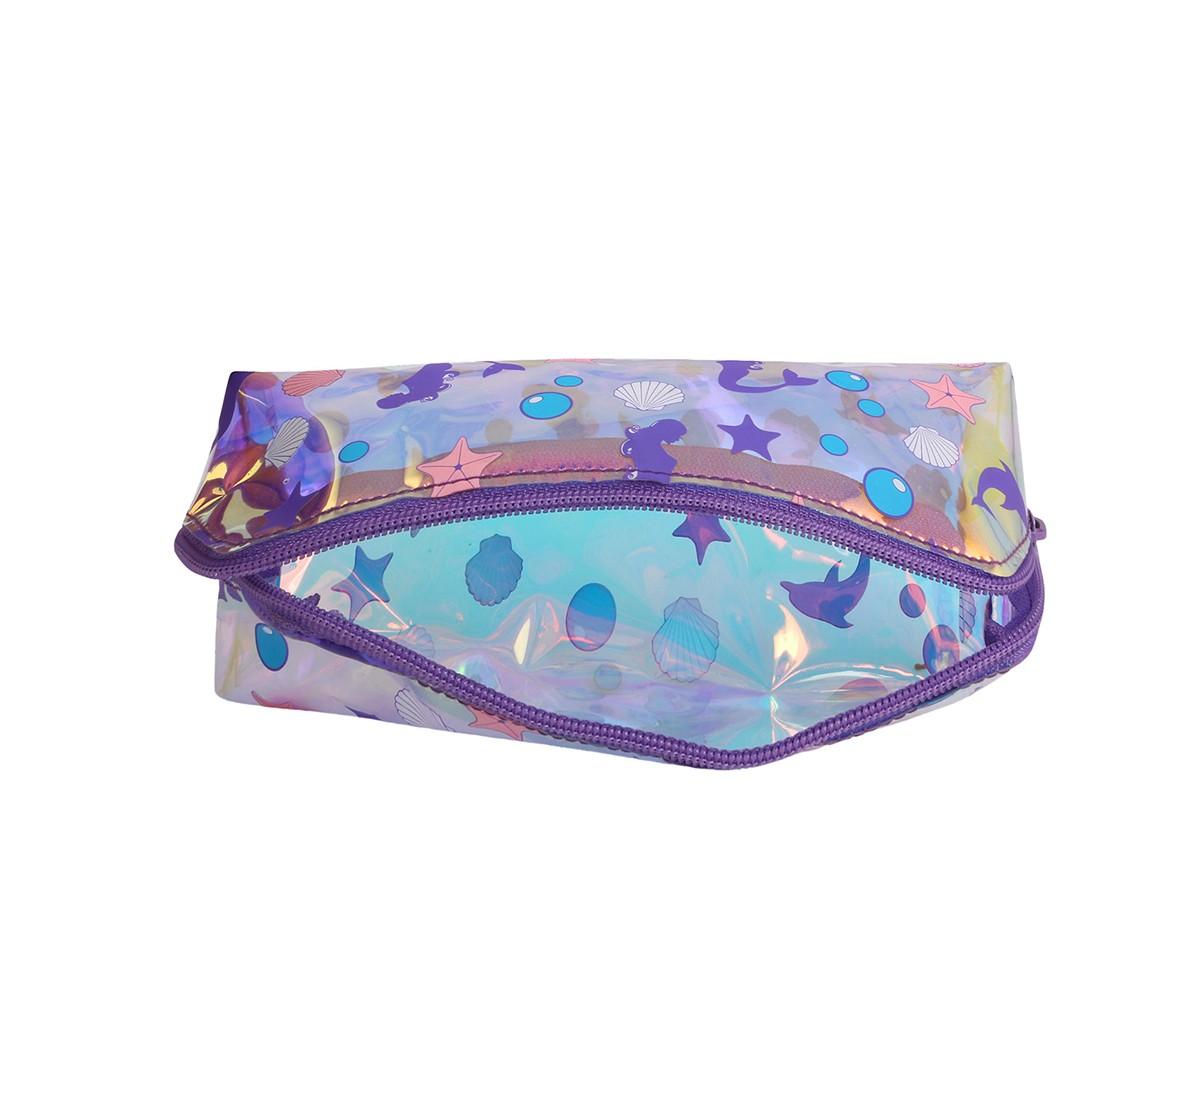 Hamster London Triangular Mermaid Pouch for Girls age 3Y+ (Purple)